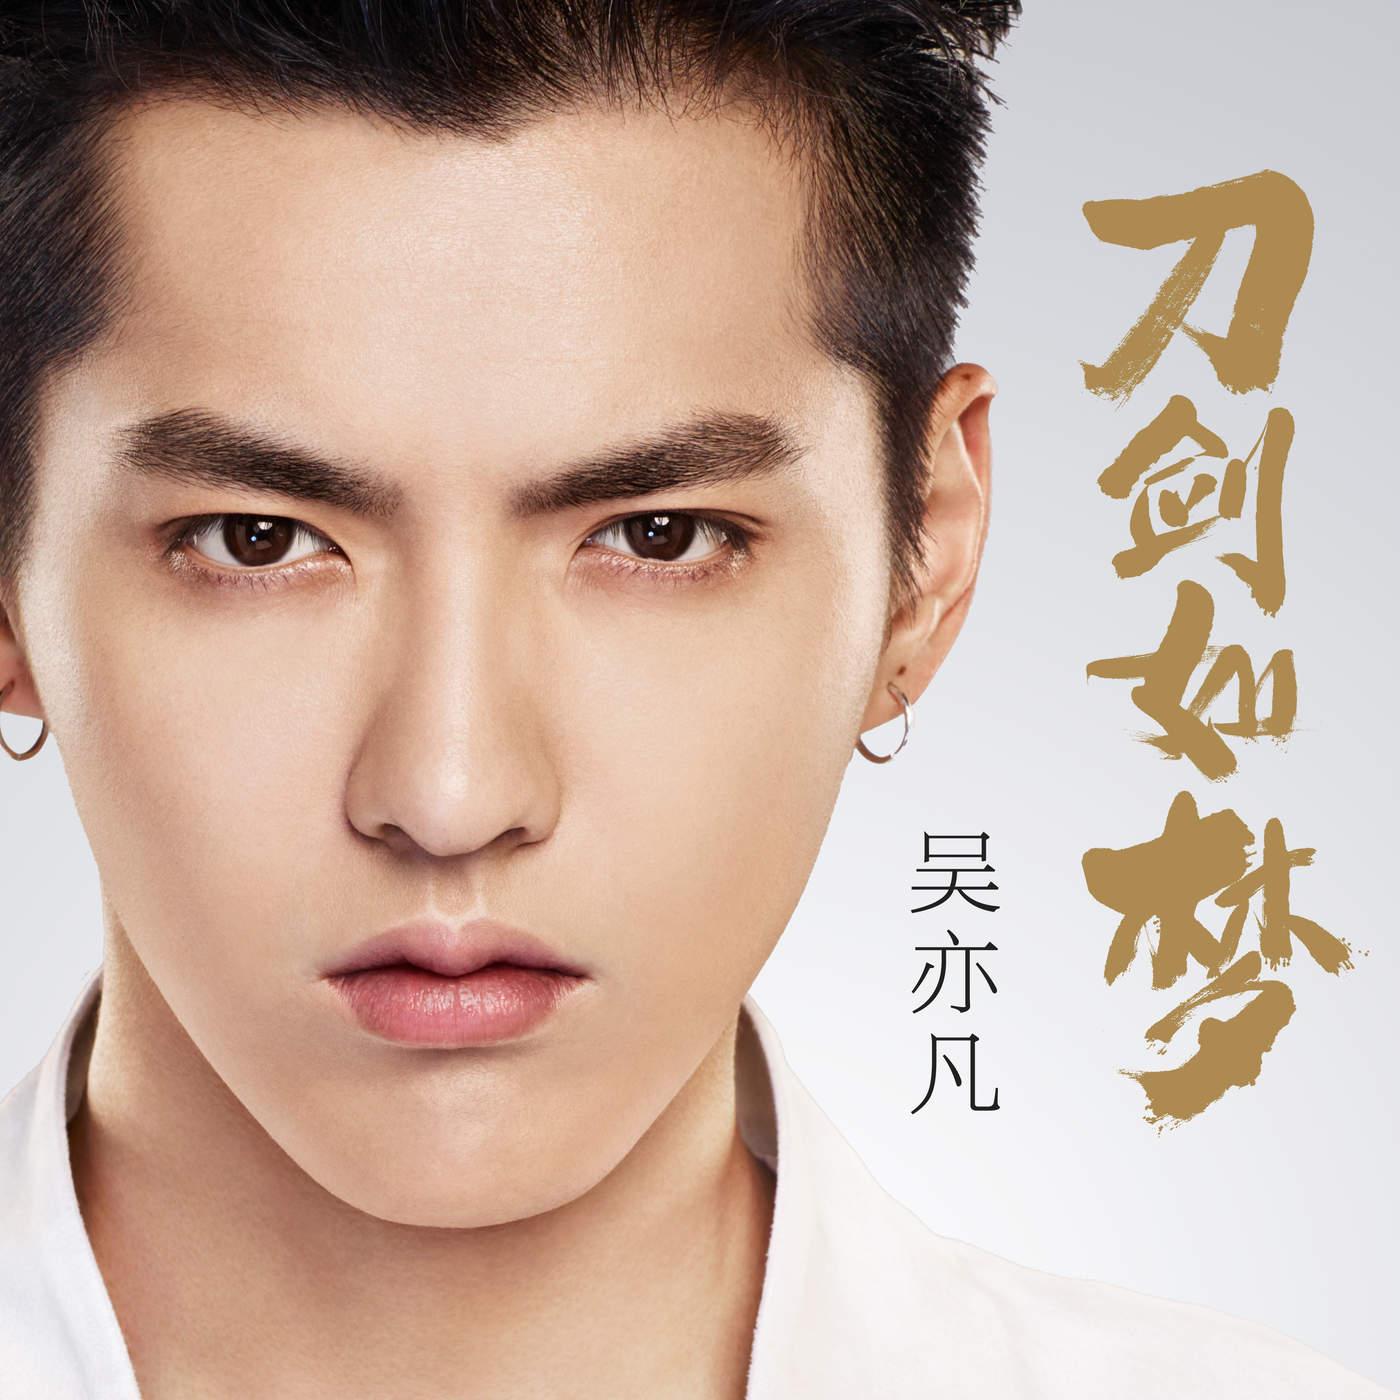 Wu Yi Fan (Kris Wu) – 刀劍如夢 (手機游戲《劍俠世界》主題曲) – Single